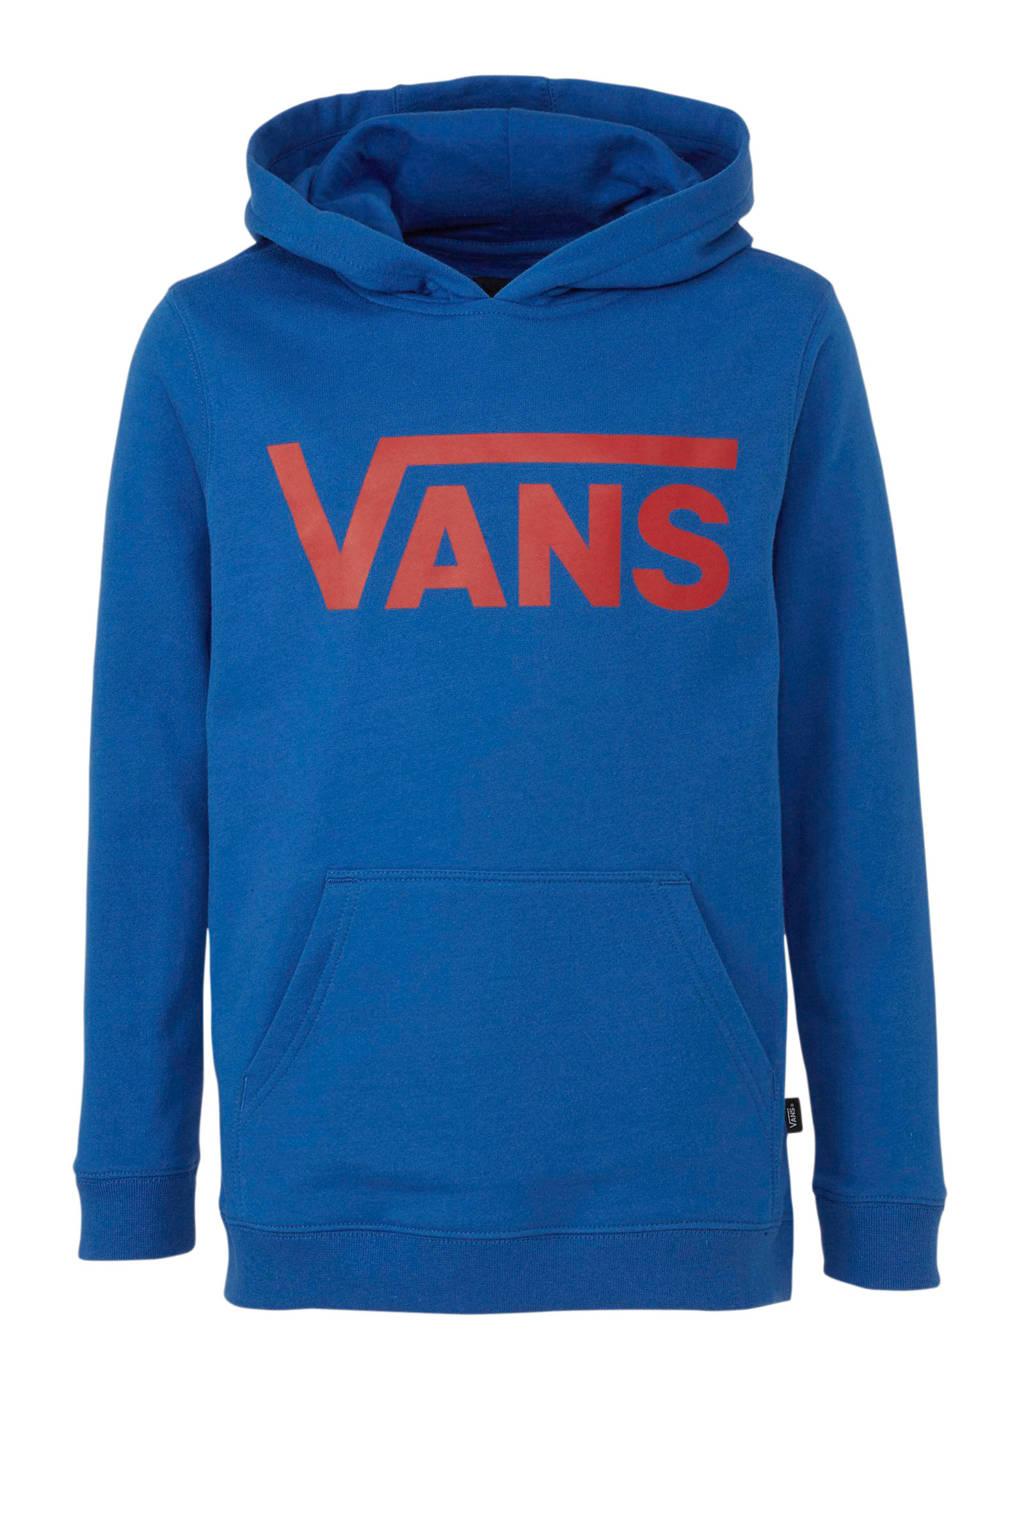 VANS hoodie met logo blauw/rood, Blauw/rood